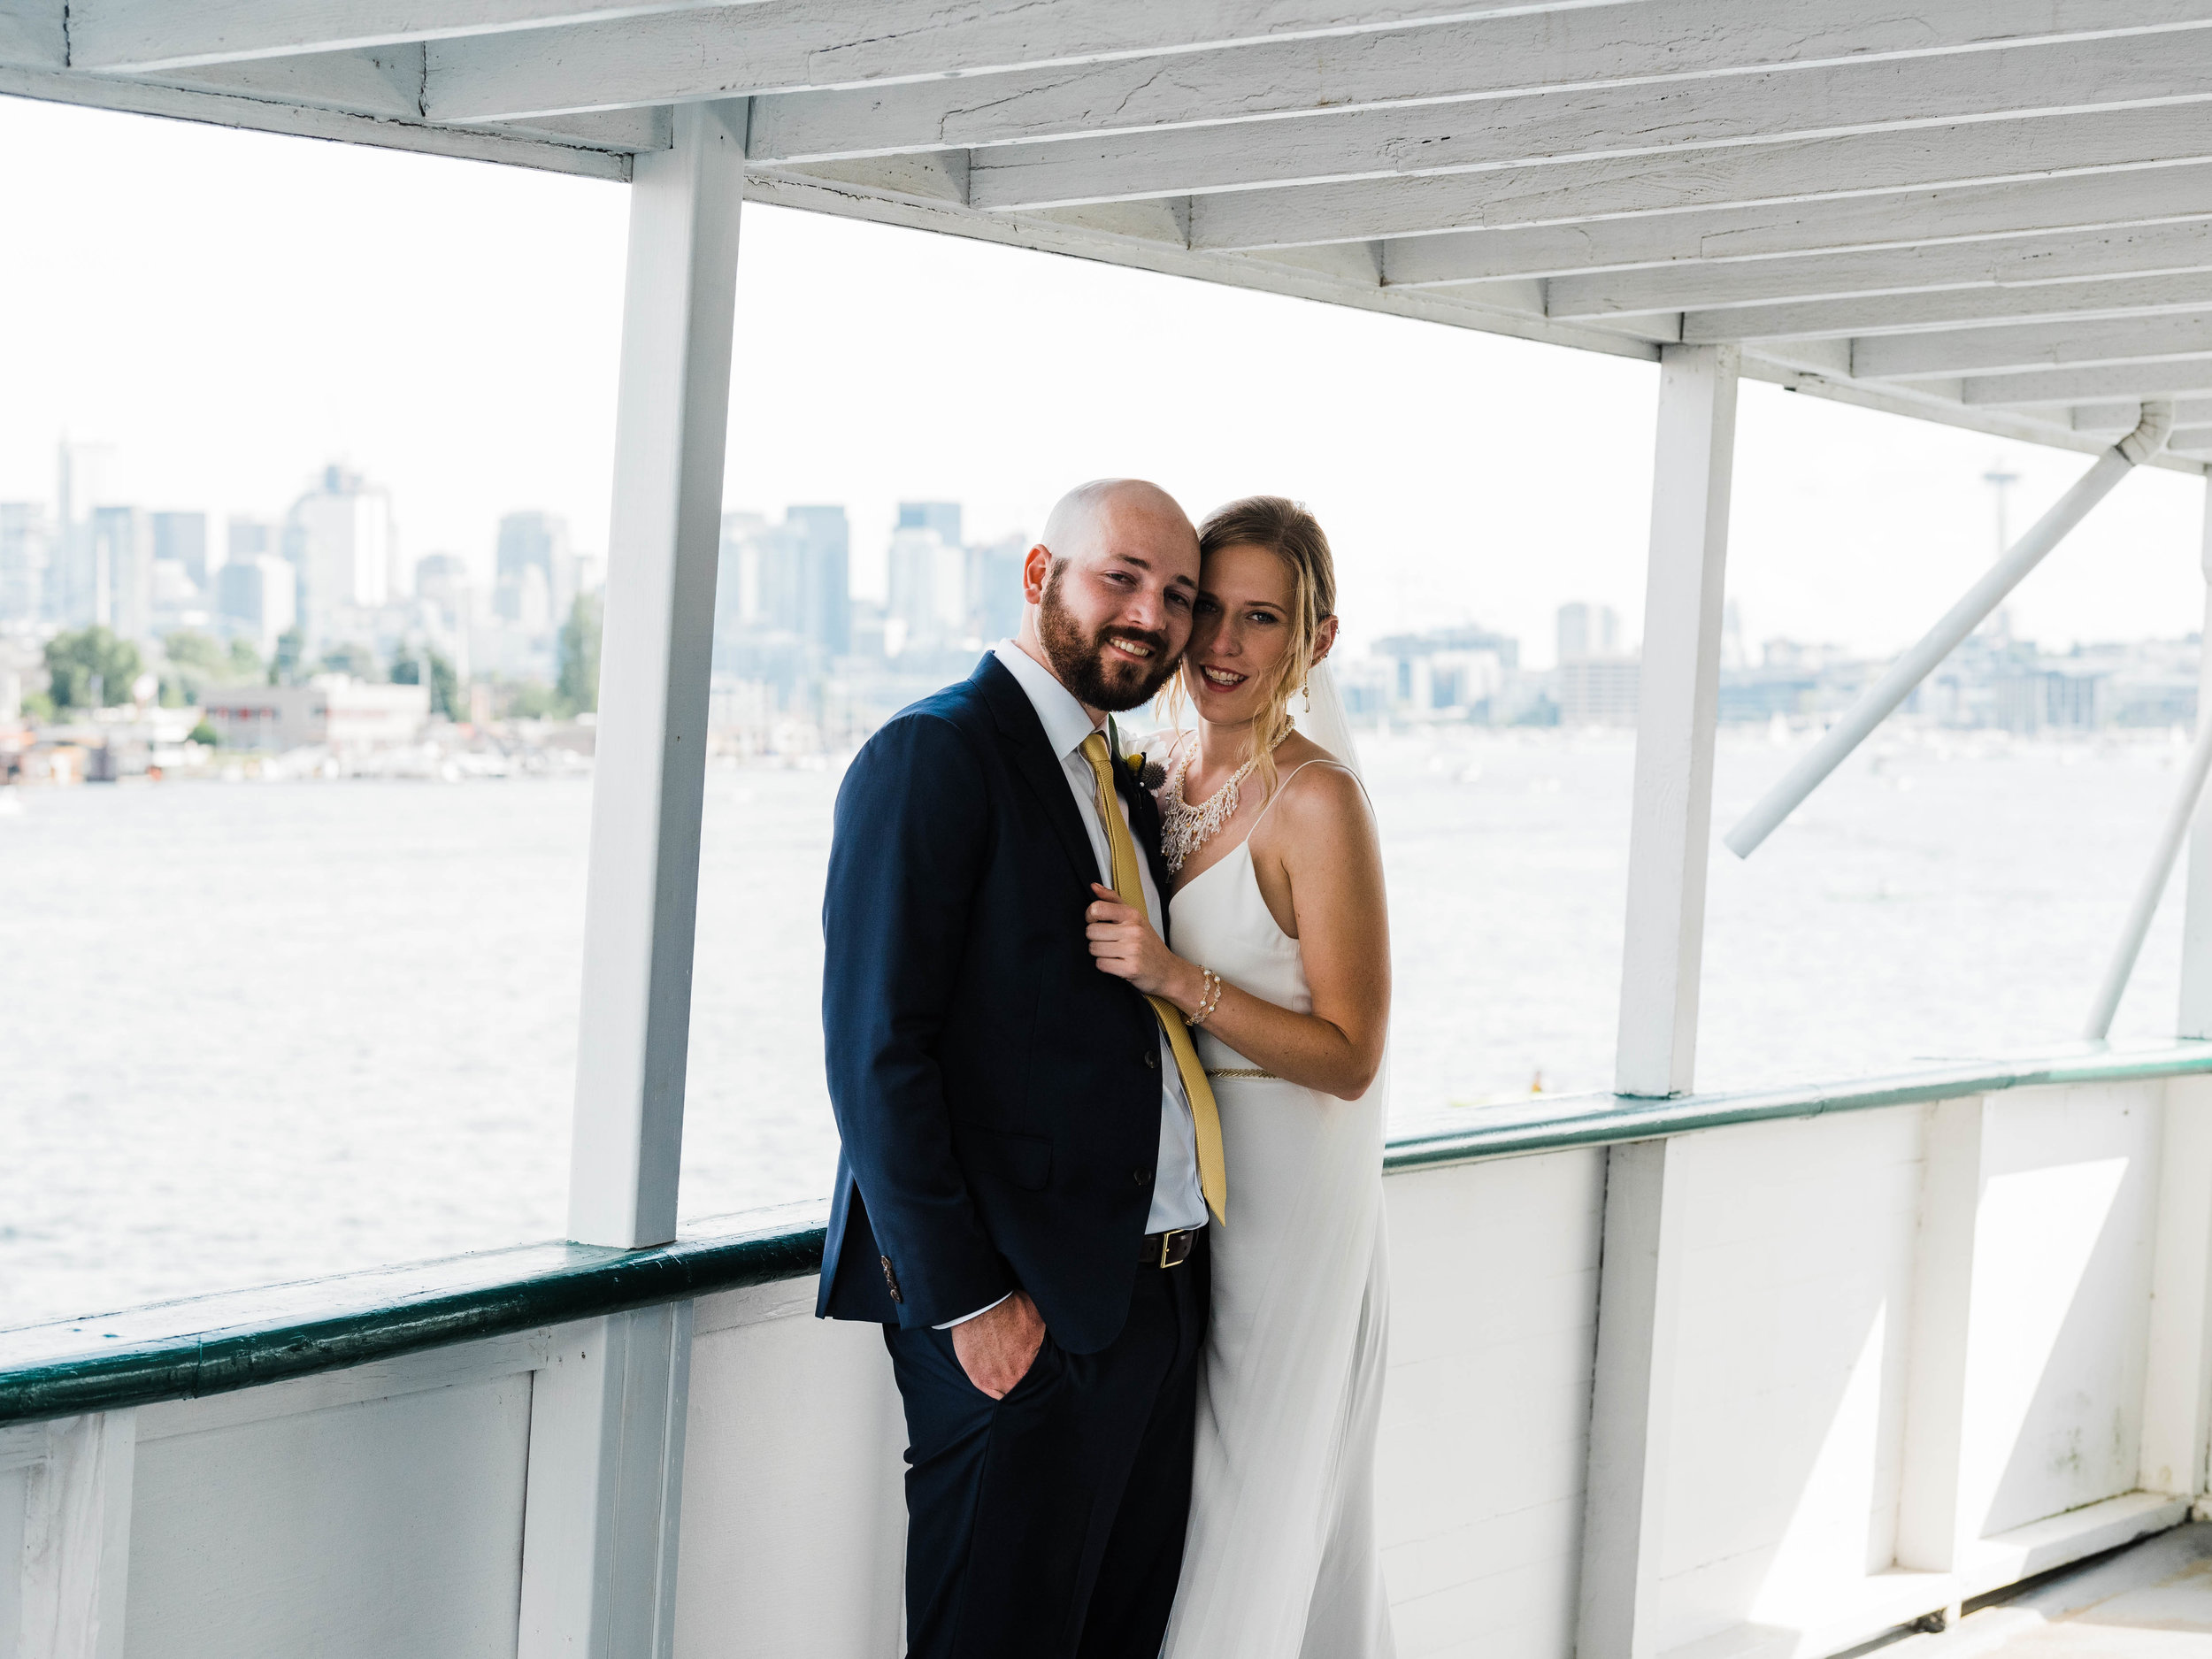 Seattle Wedding- MV Skansonia - Anna + Josh -  (1168) - Copy.jpg